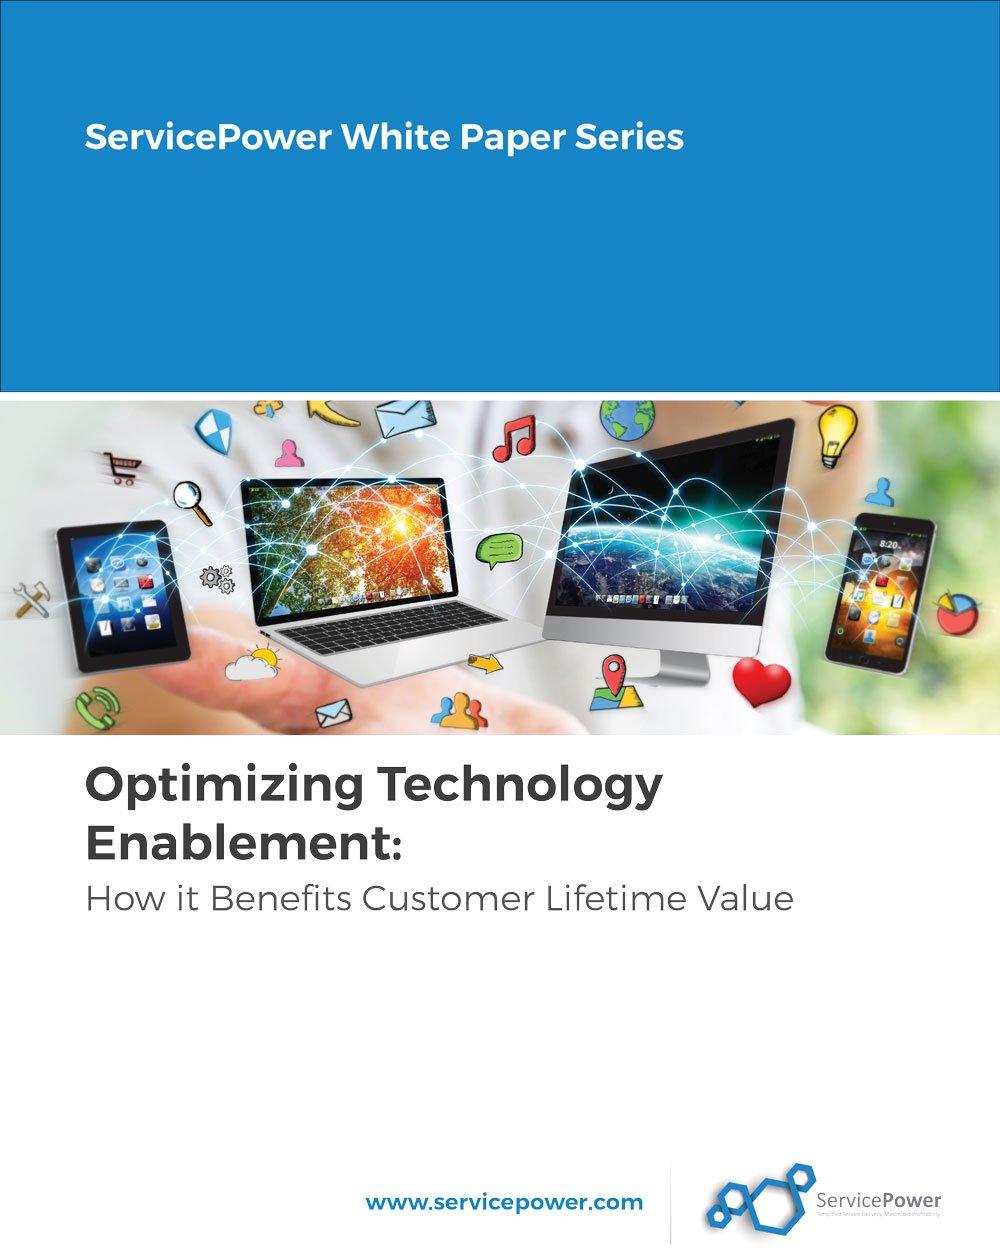 Free Whitepaper - Optimizing Technology Enablement: How it Benefits Customer Lifetime Value